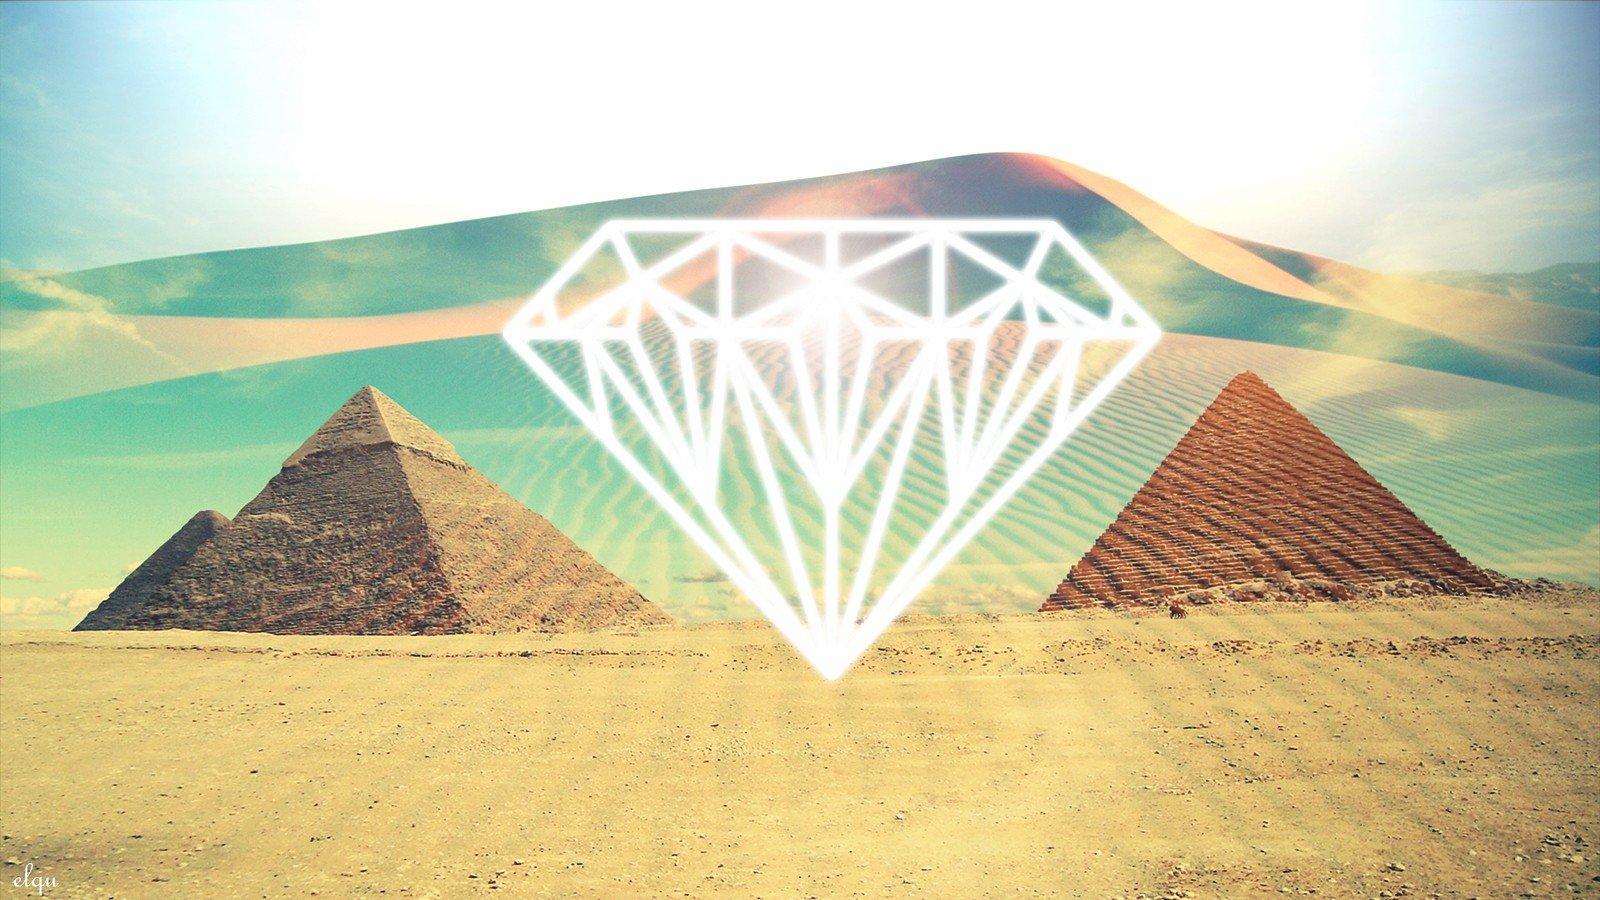 deserts artwork diamonds pyramids diamond wallpaper background 1600x900